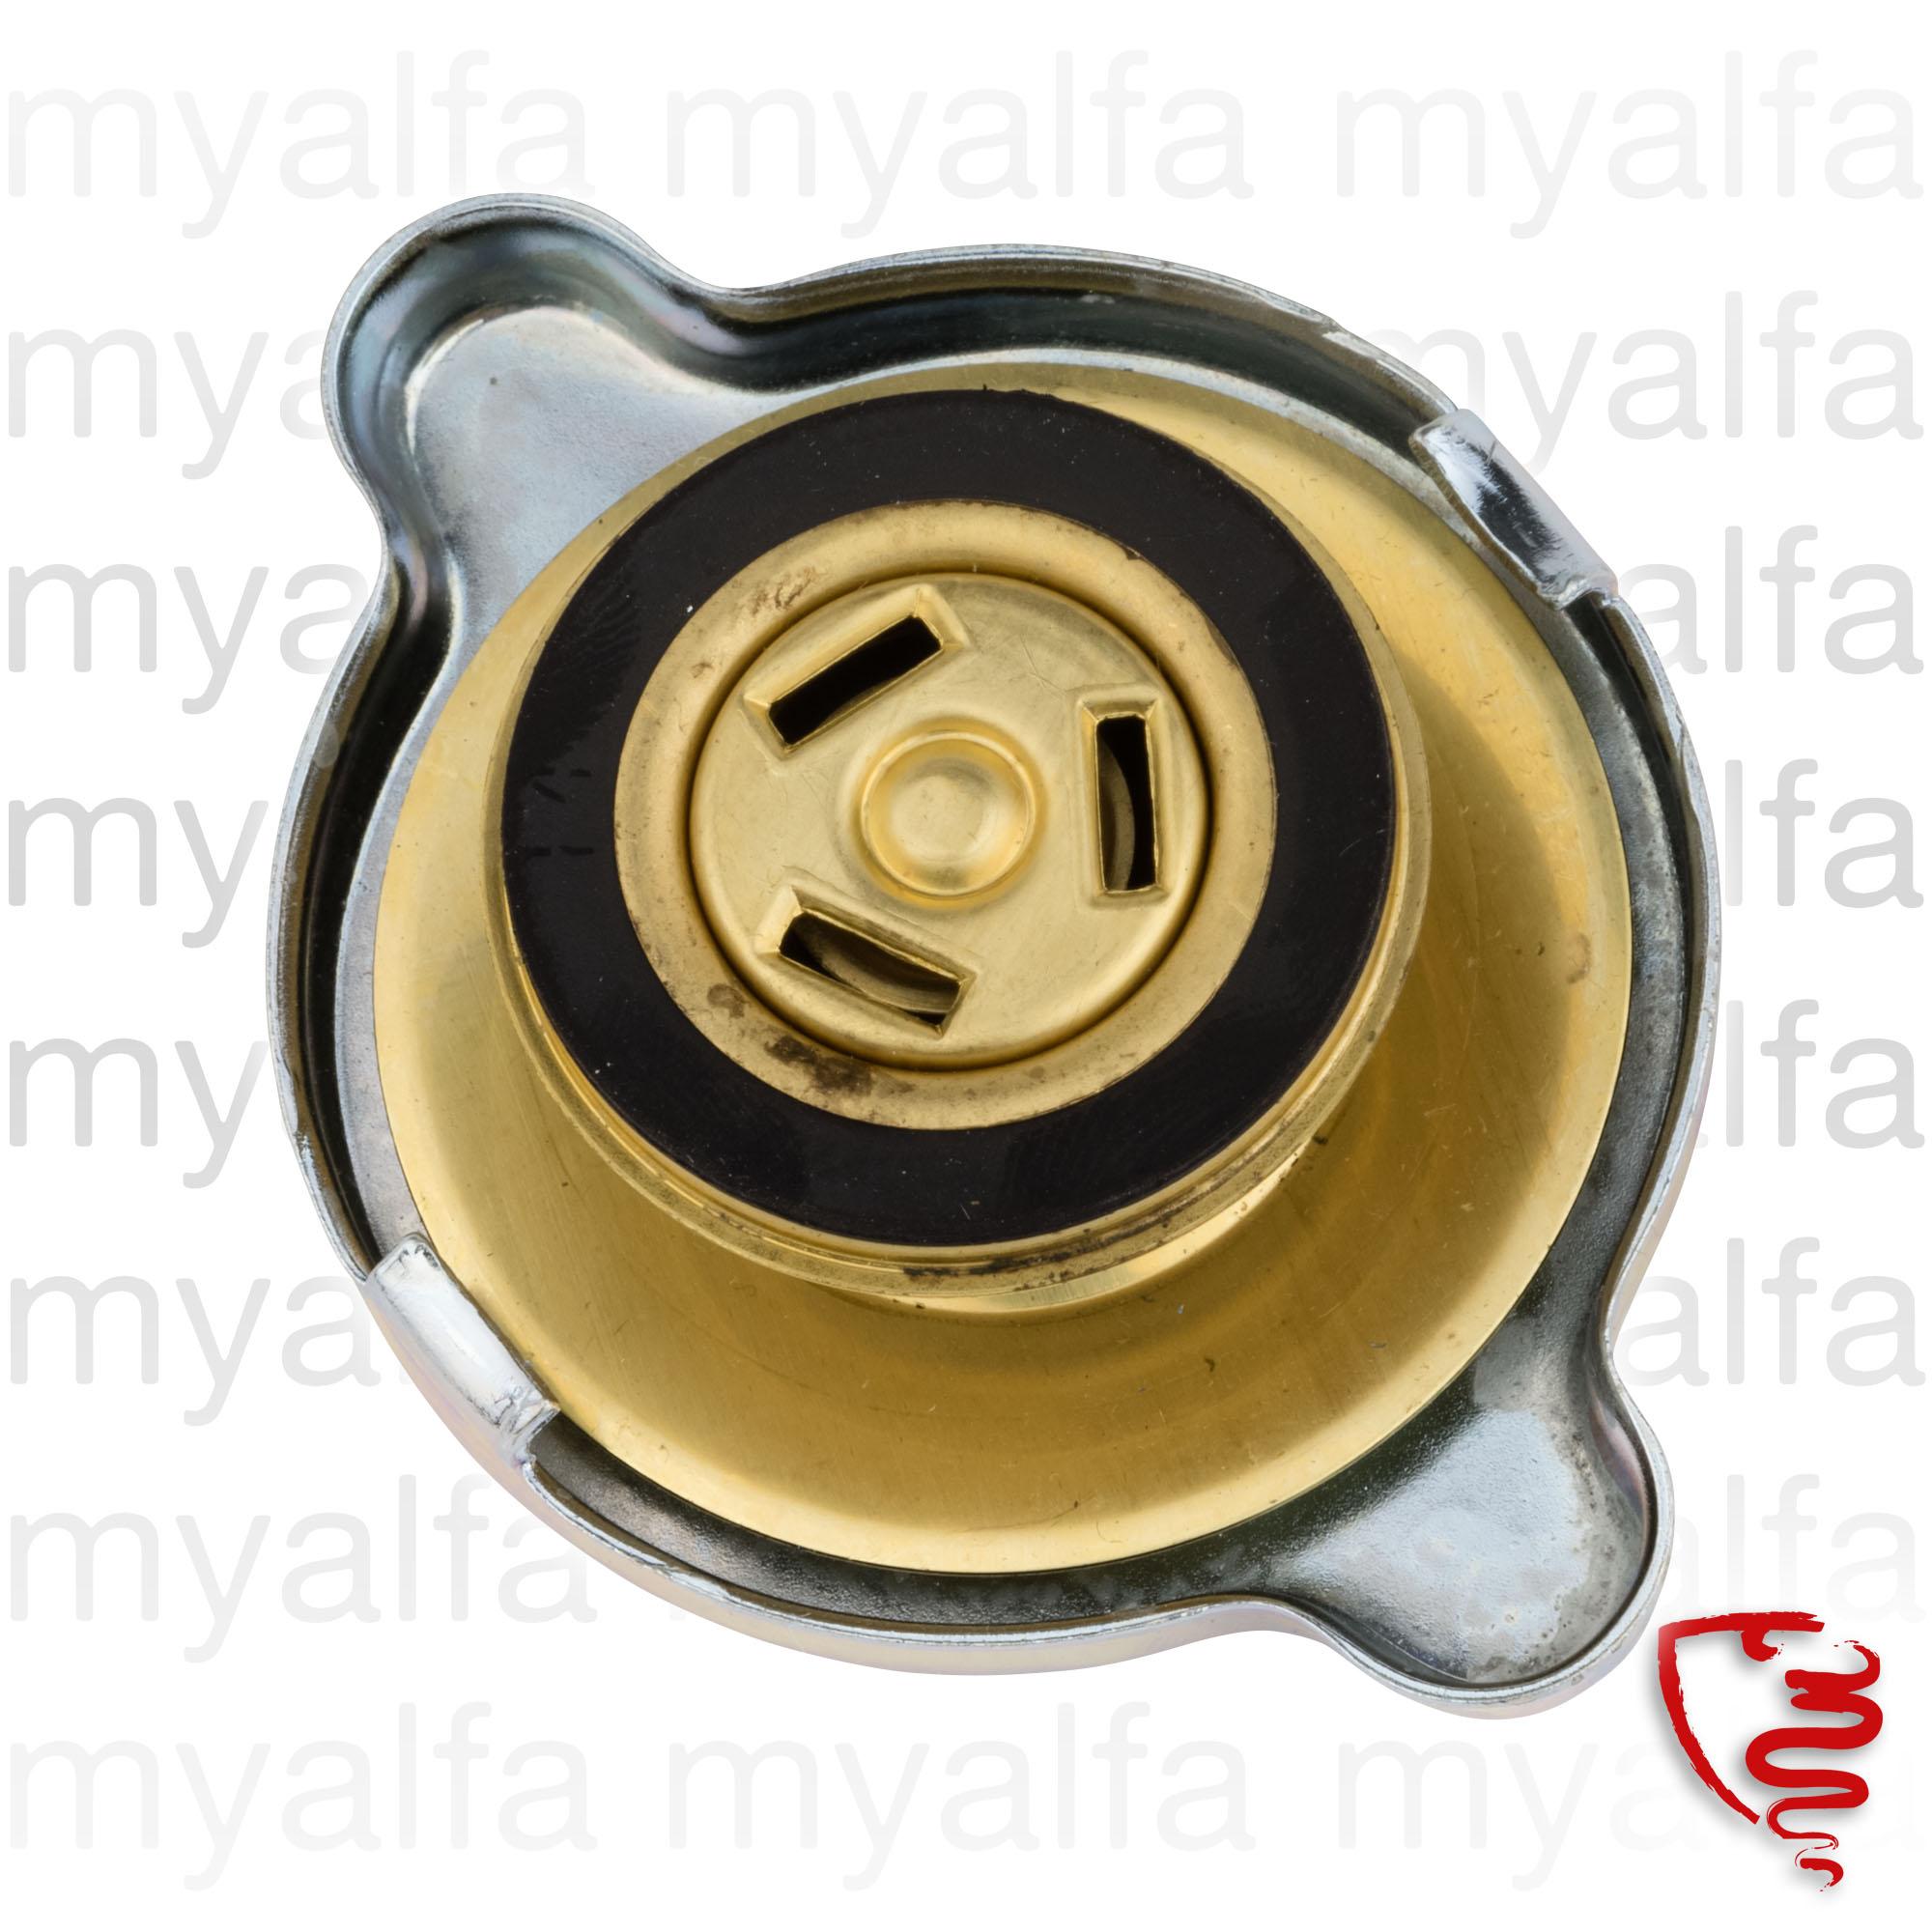 round radiator cap for 105/115, Cooling System, Radiator